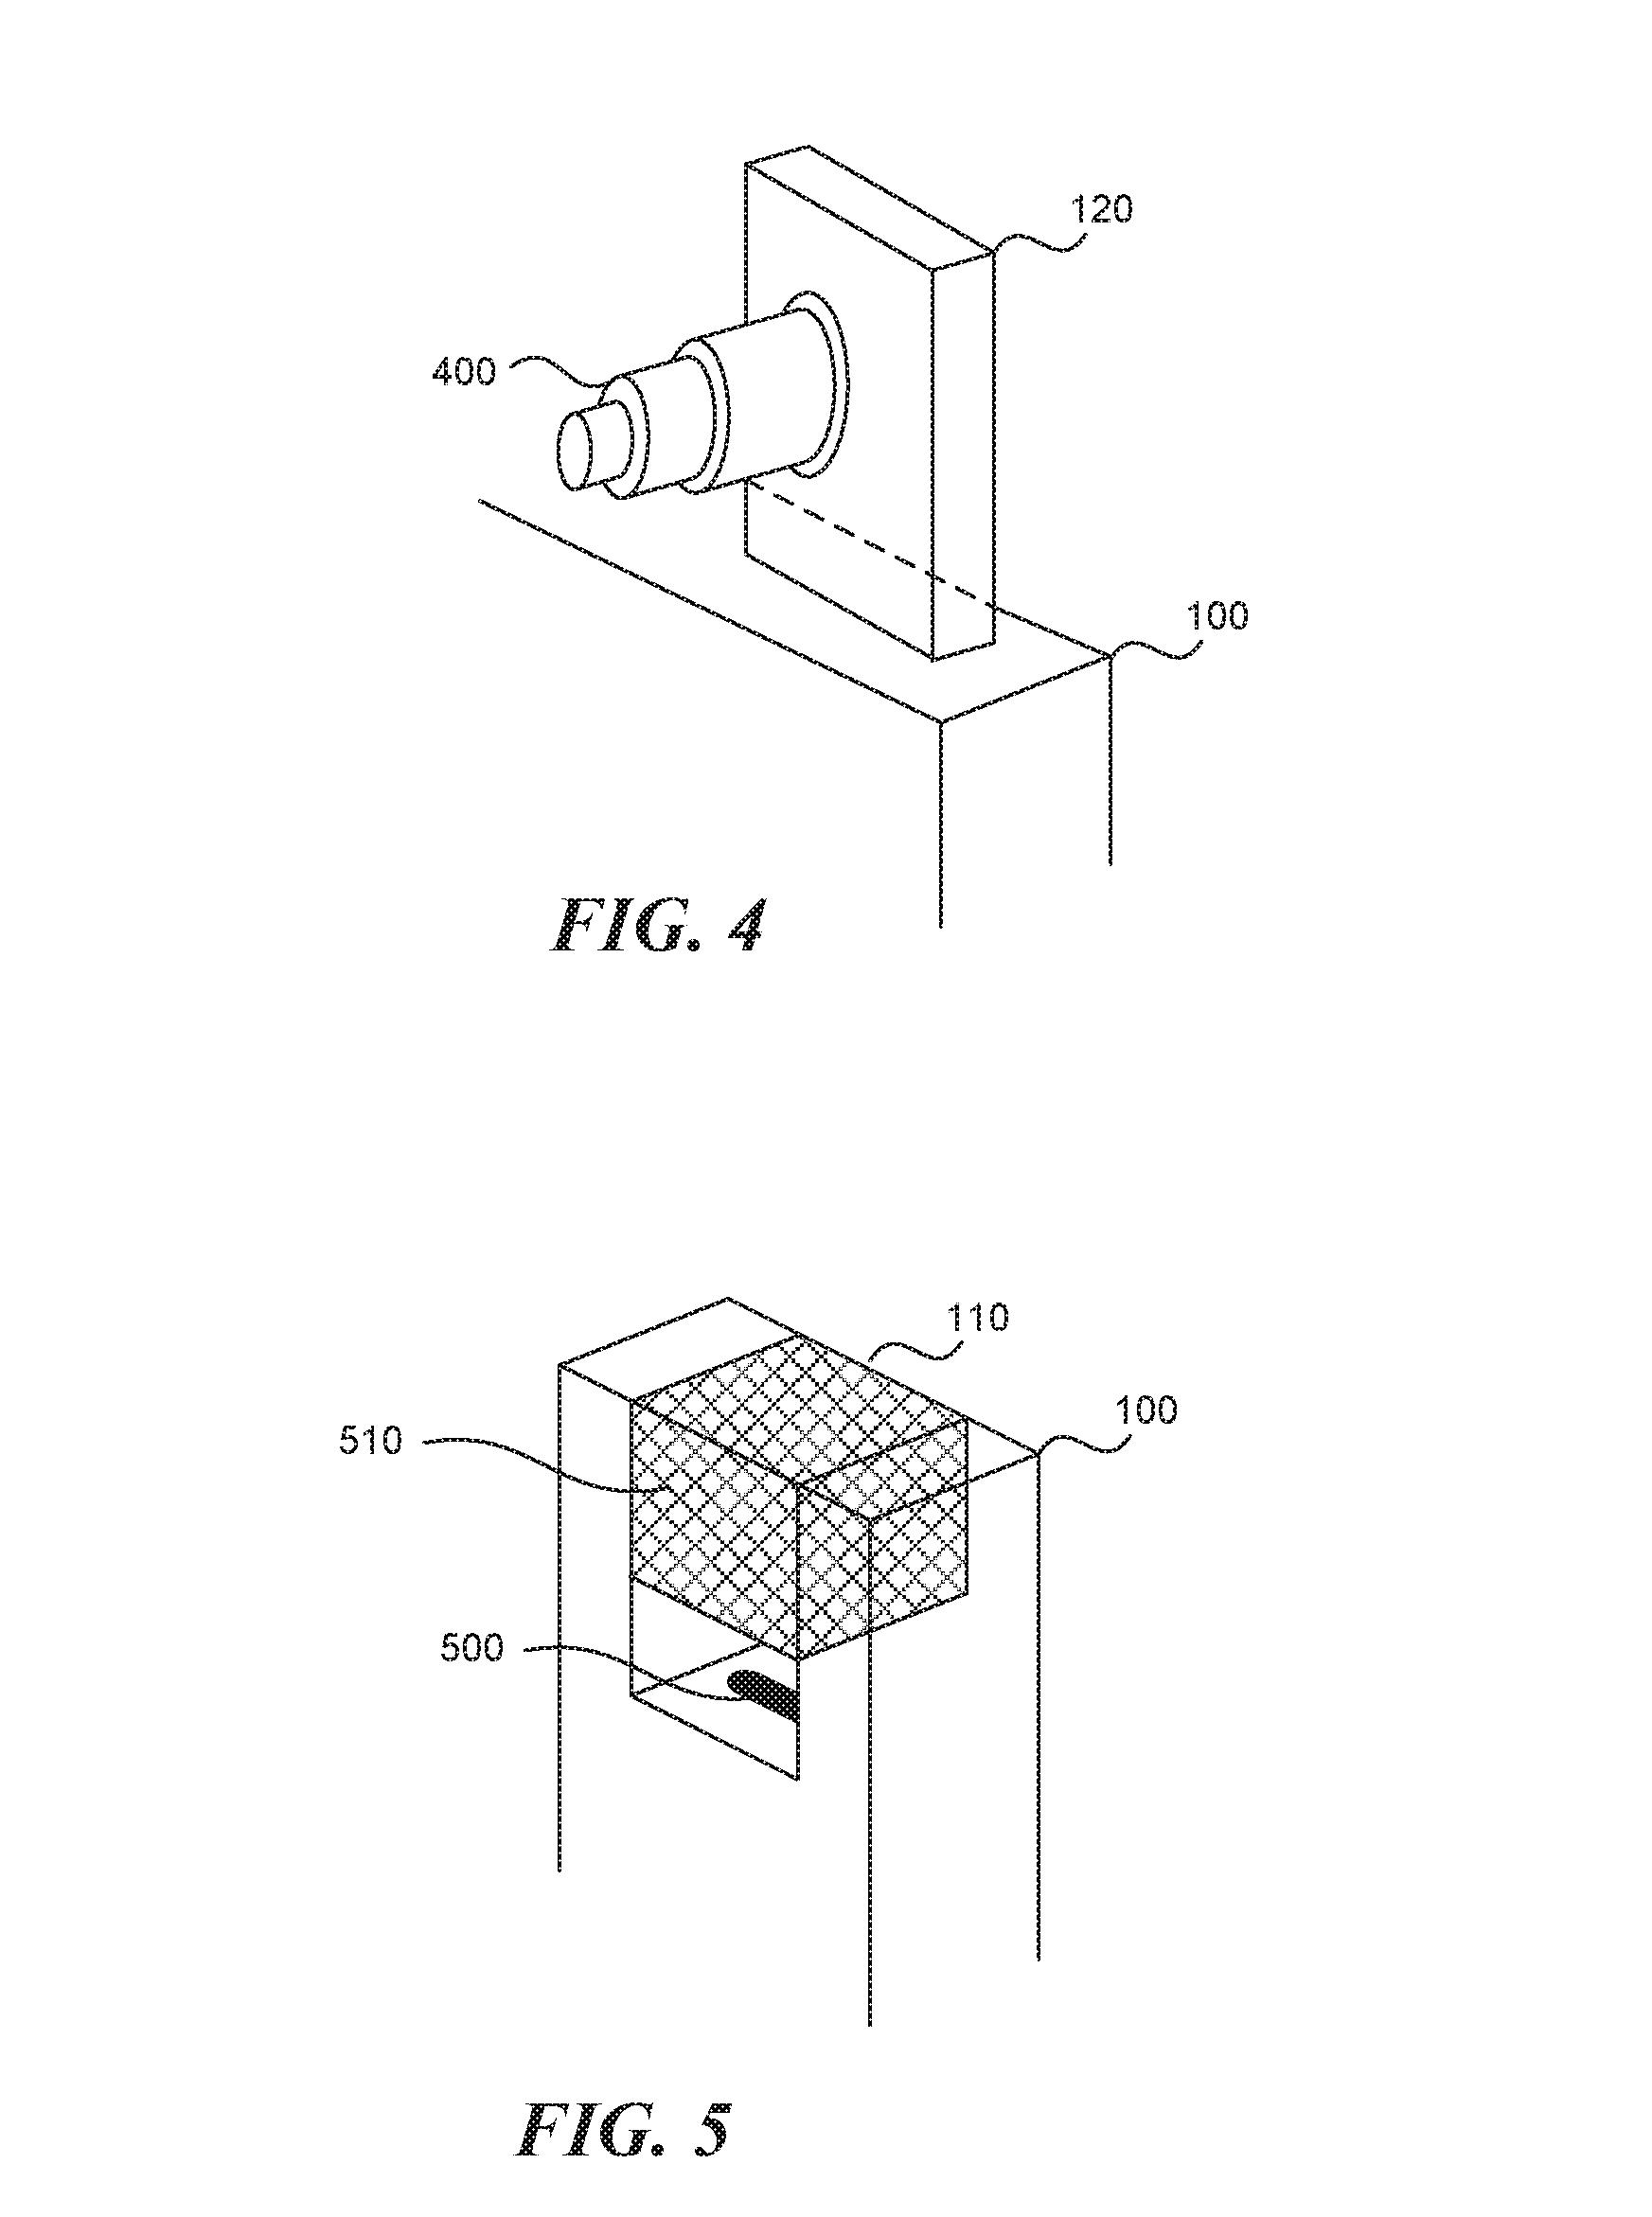 Essential Pop up Camera Patent 17